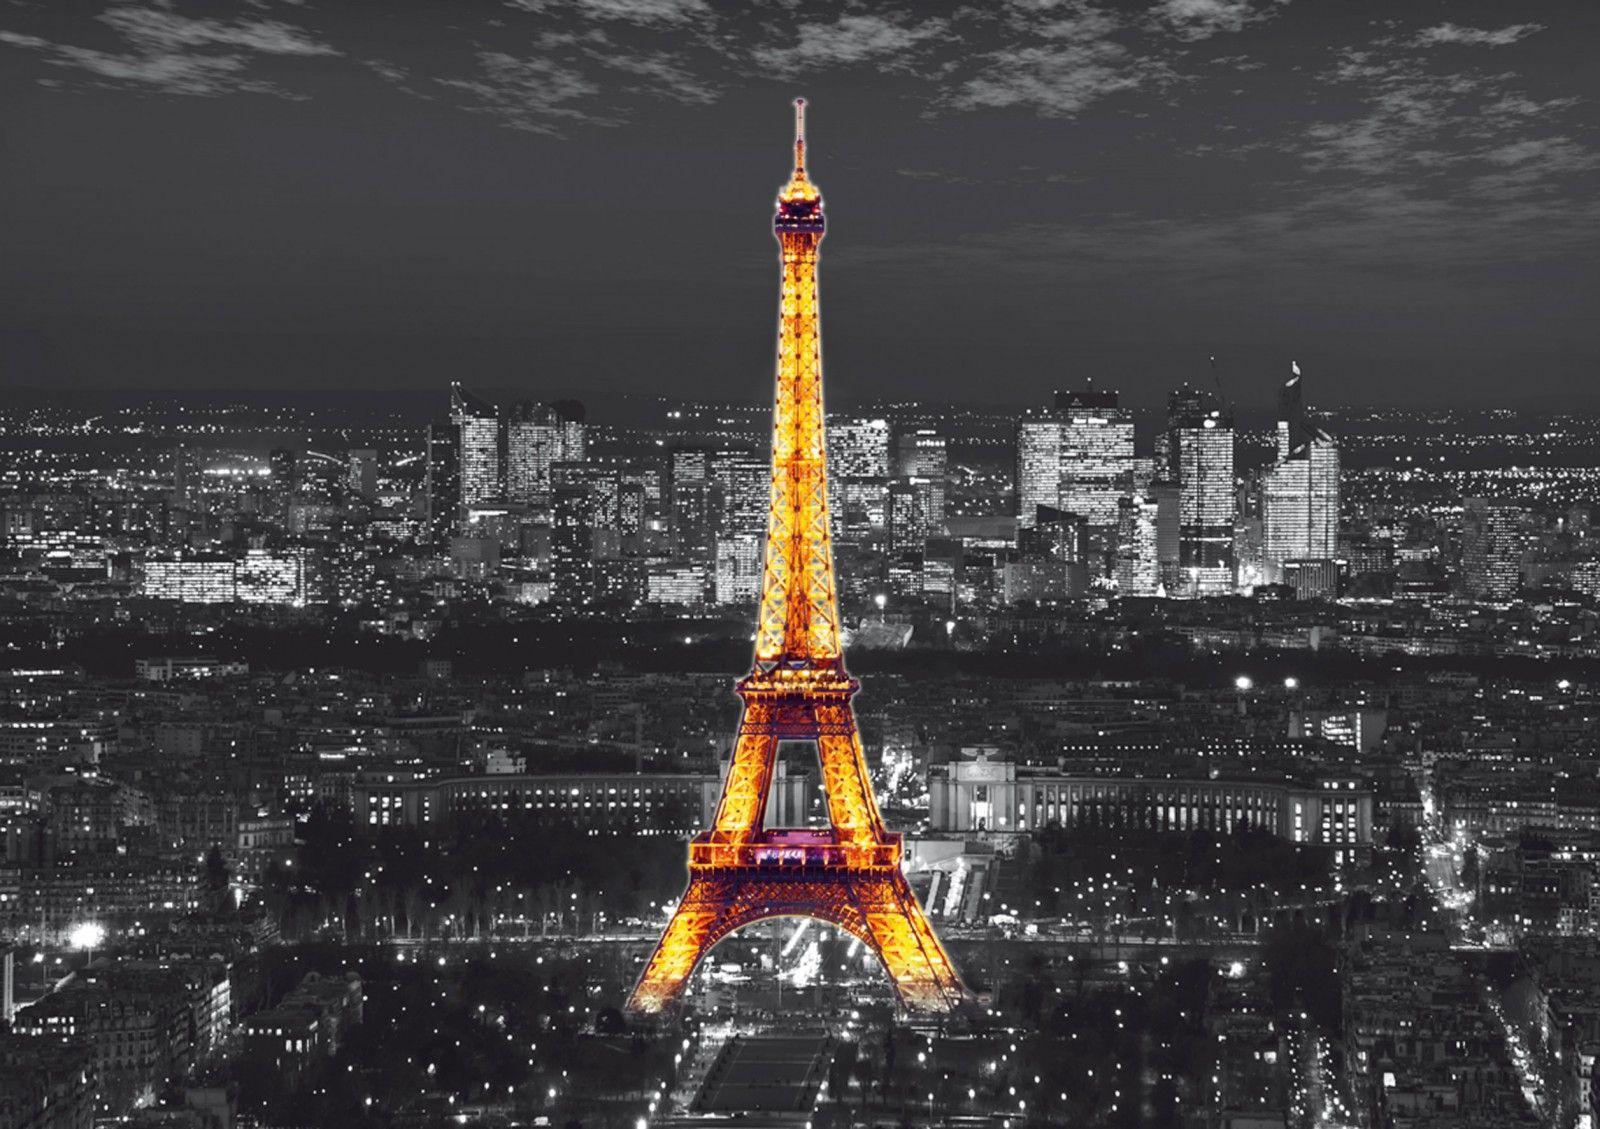 Paris skyline wallpapers top free paris skyline backgrounds wallpaperaccess - Paris tower live wallpaper ...